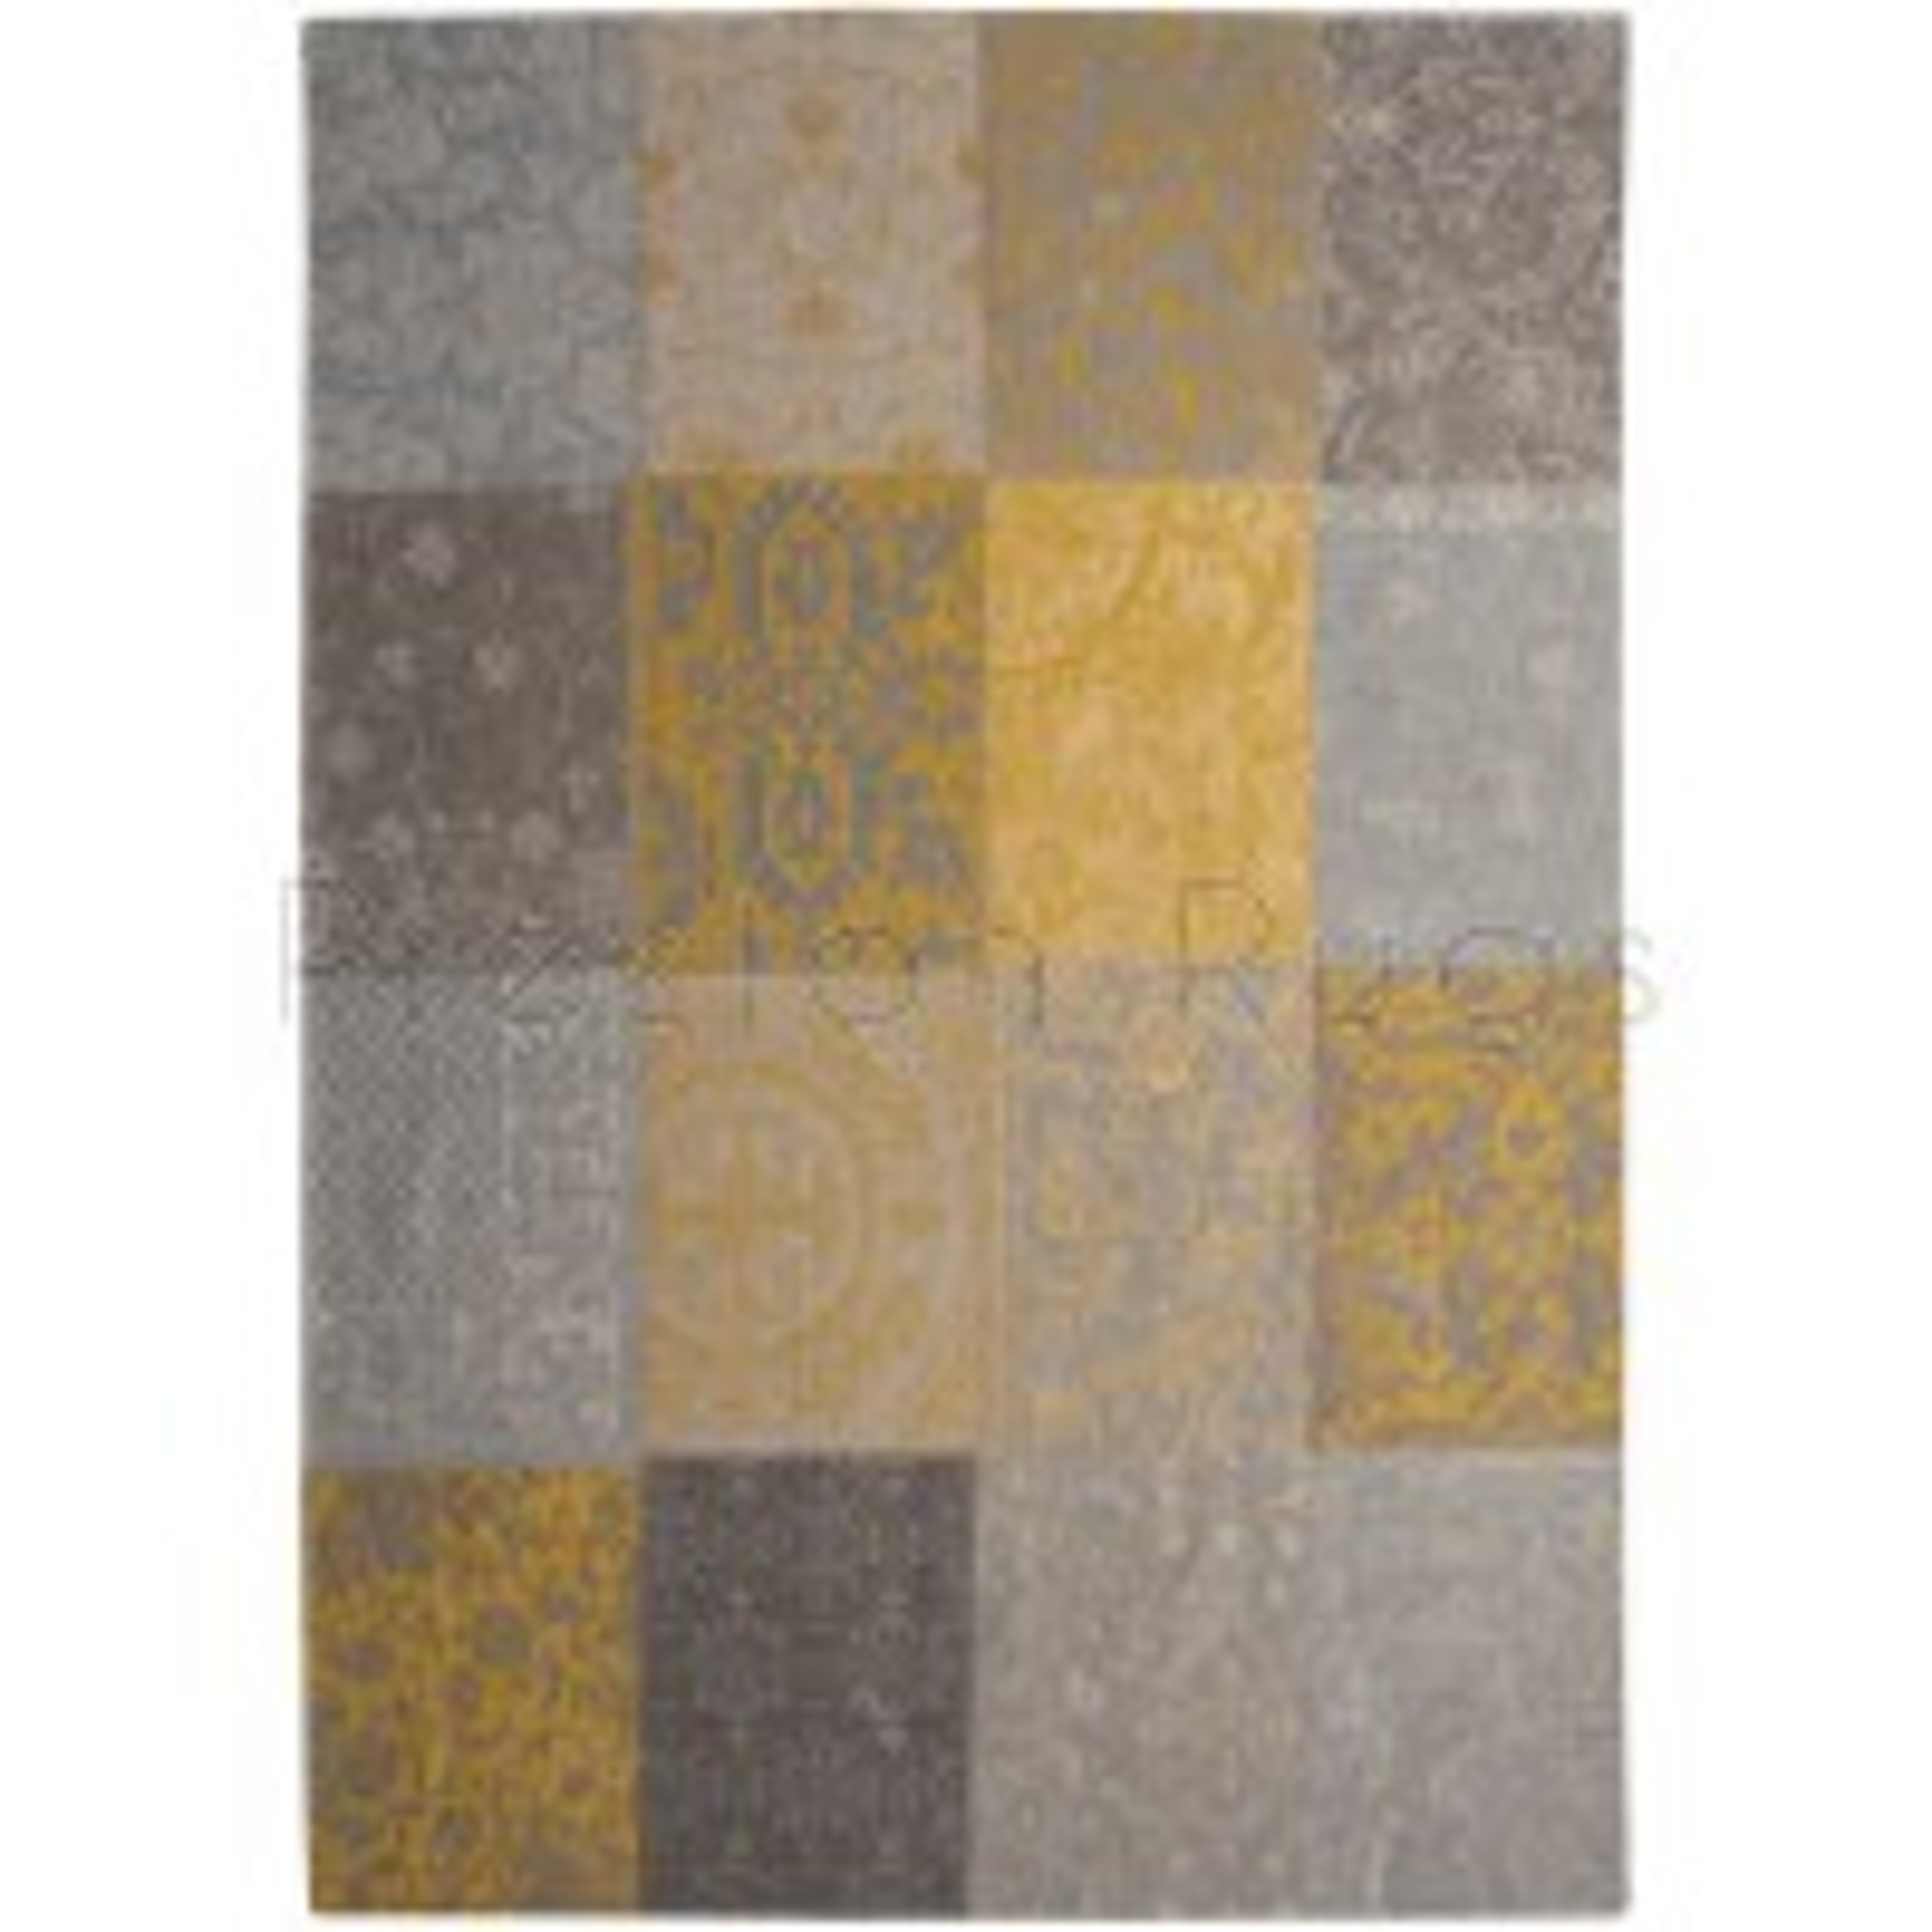 "New Vintage Yellow 8084 Rug by Louis de Poortere-140 x 200 cm (4'7"" x 6'7"")"